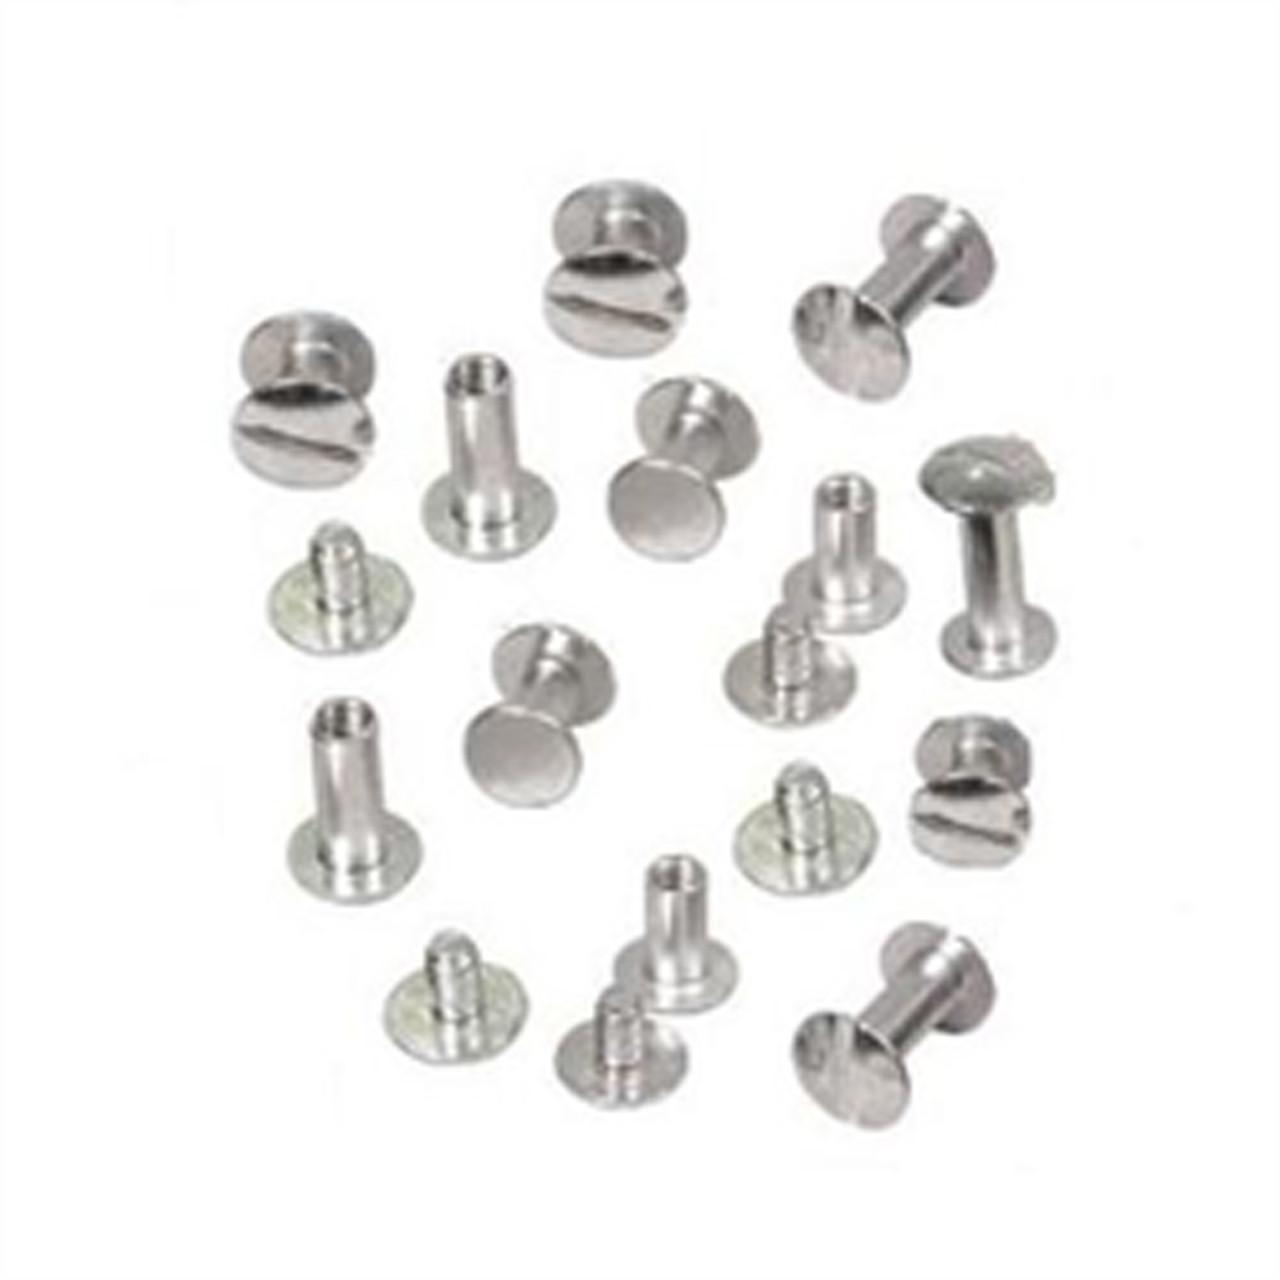 Fastin™ Aluminum Binding Posts & Screws, Under 1